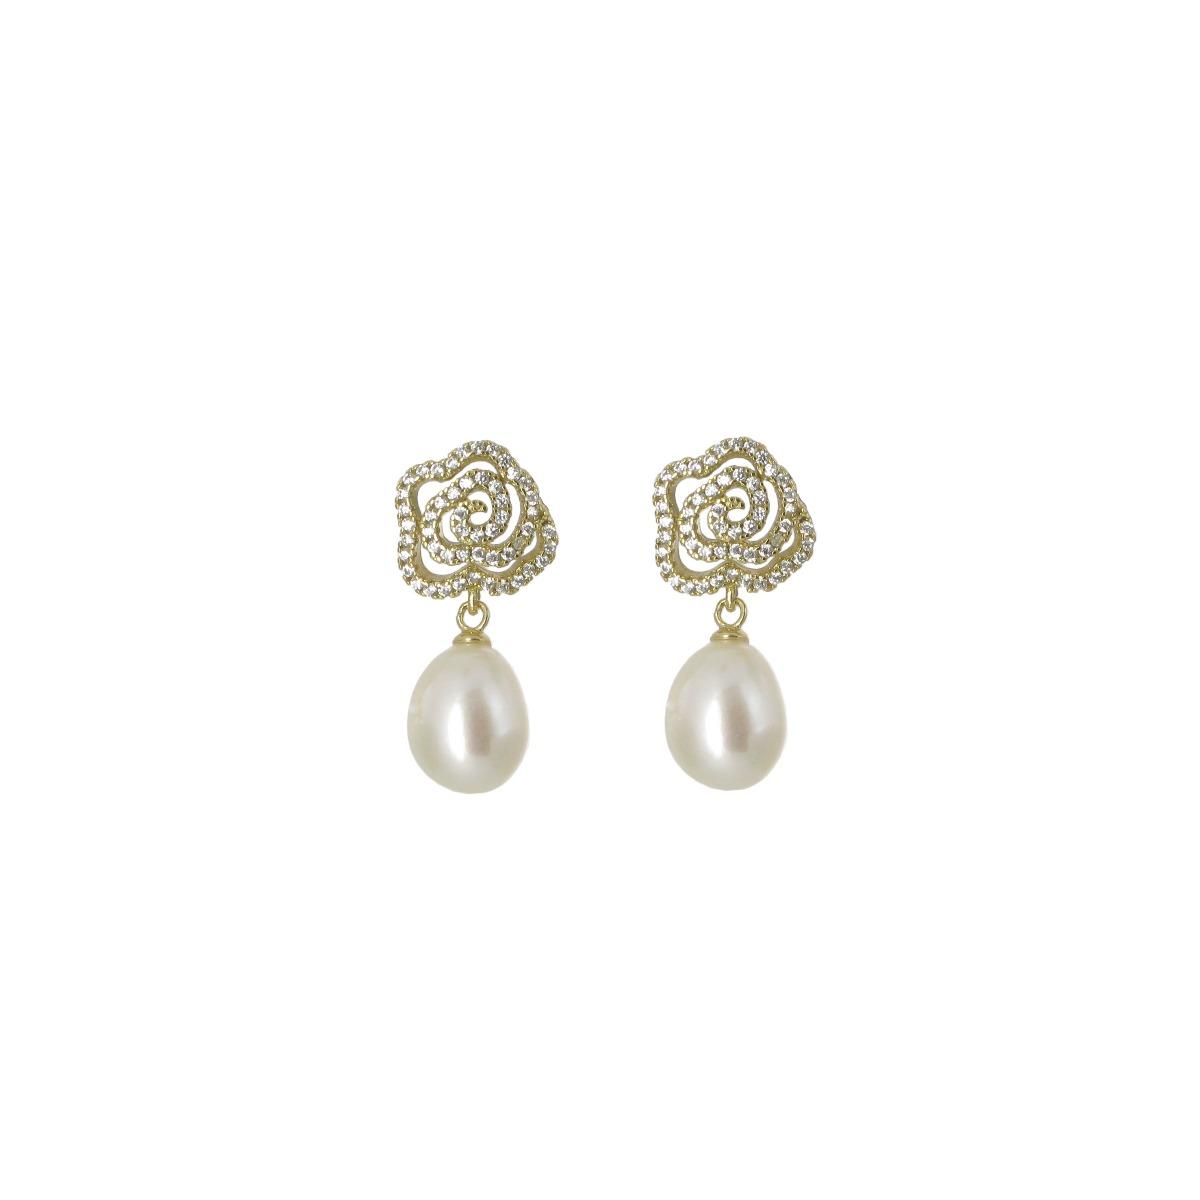 White pearl camelia drop earrings